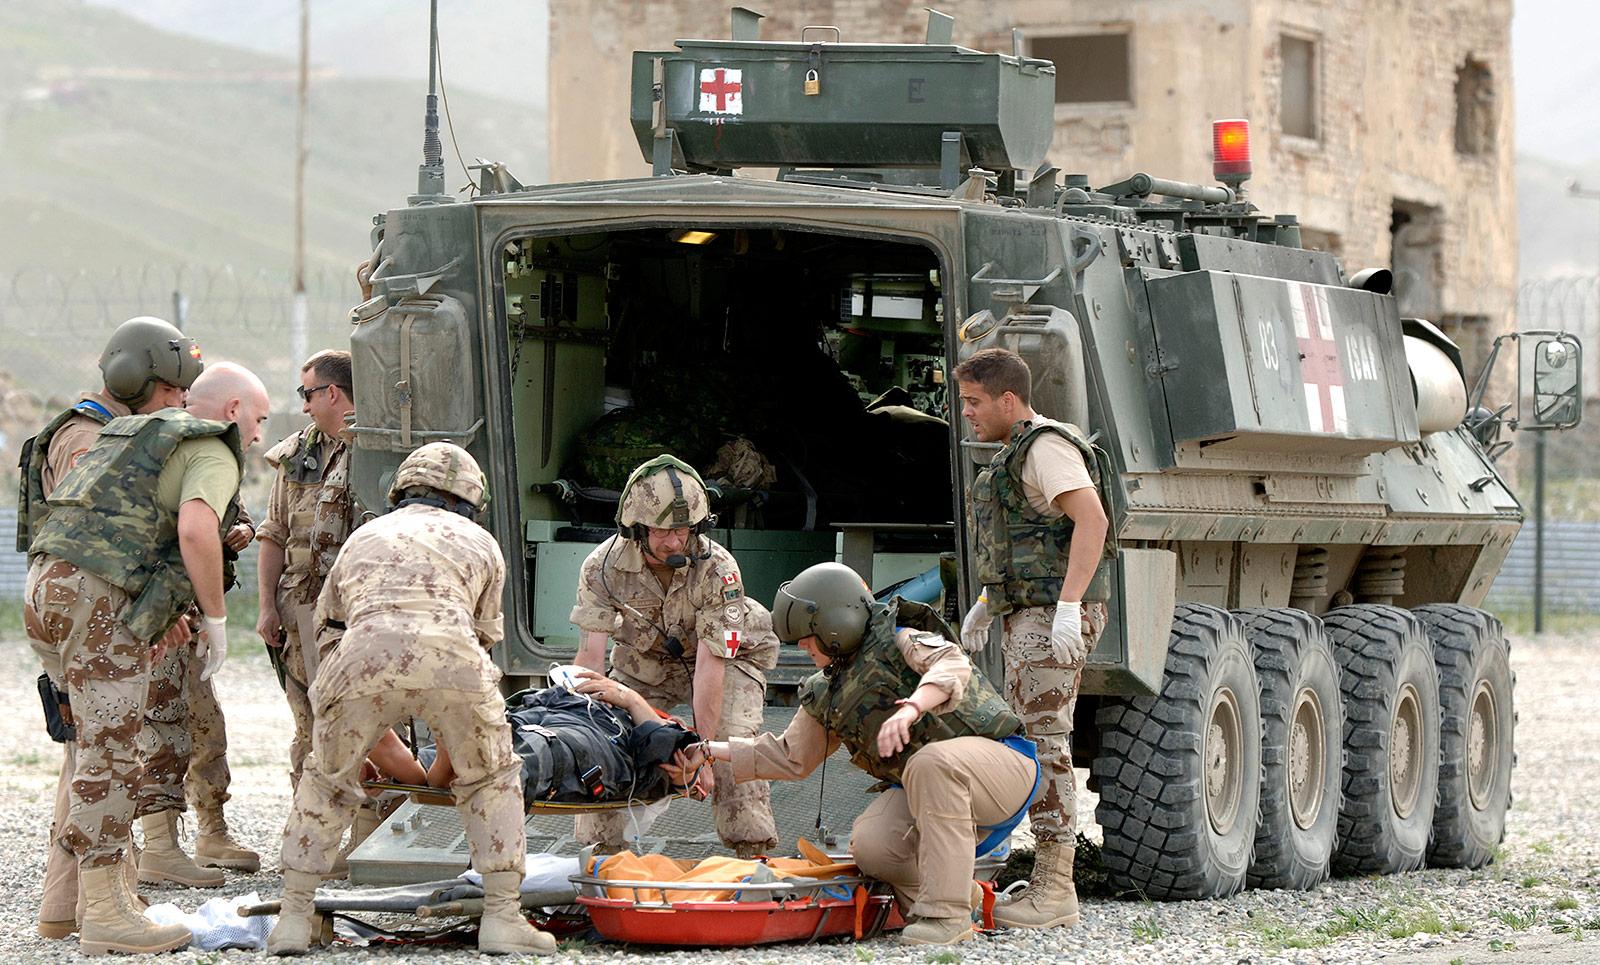 Bison Ambulance in Afghanistan